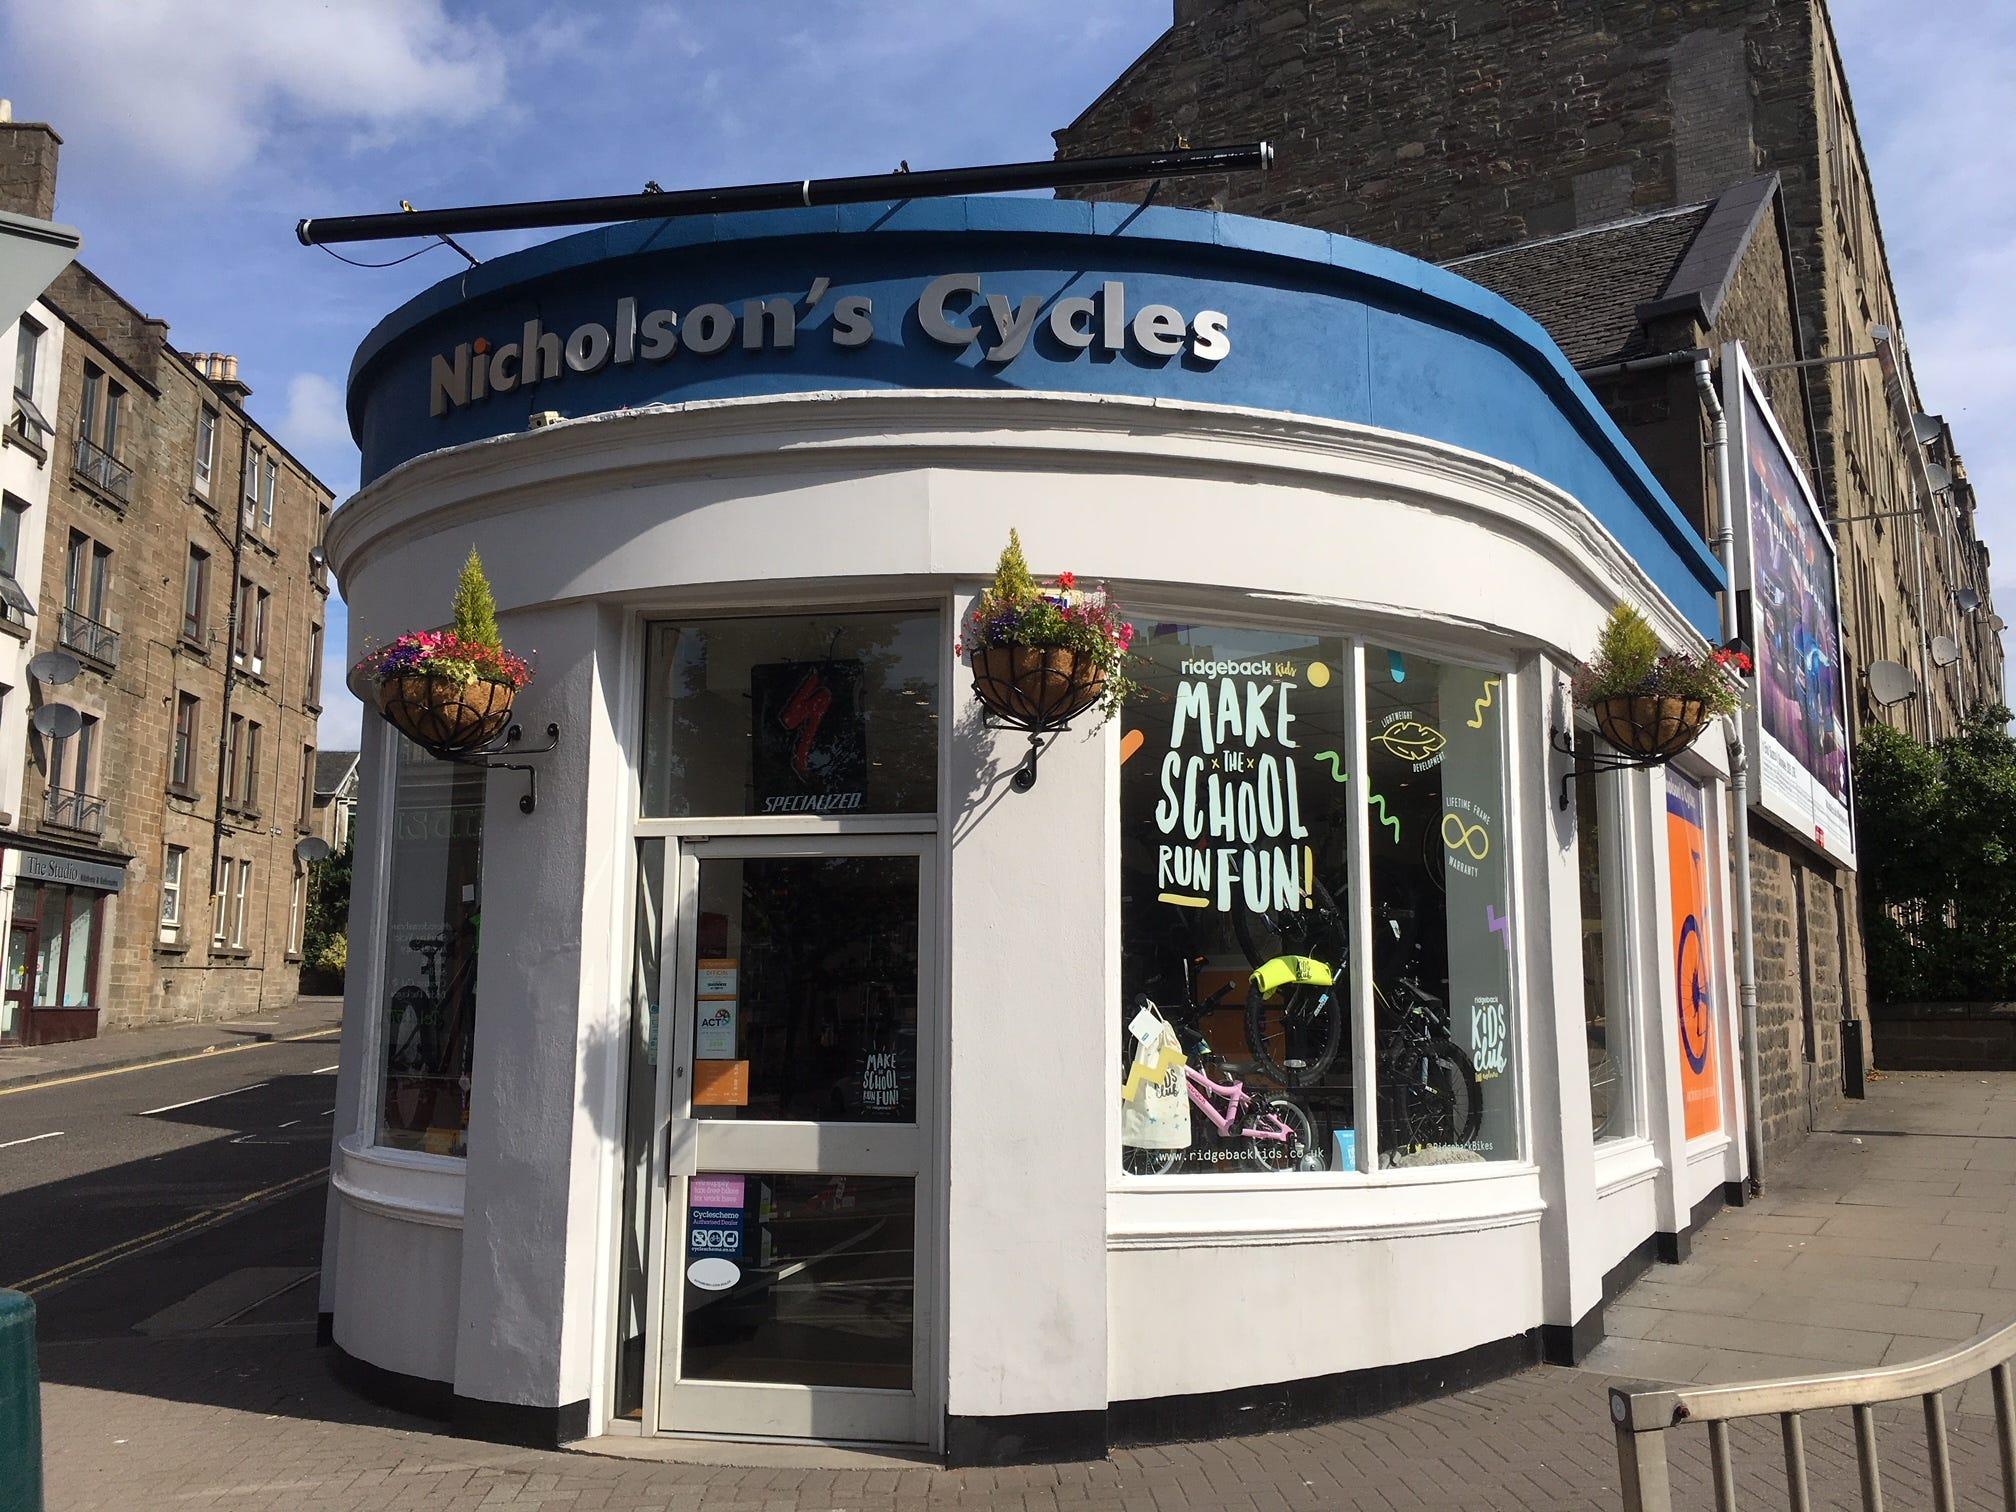 NICHOLSON'S CYCLES